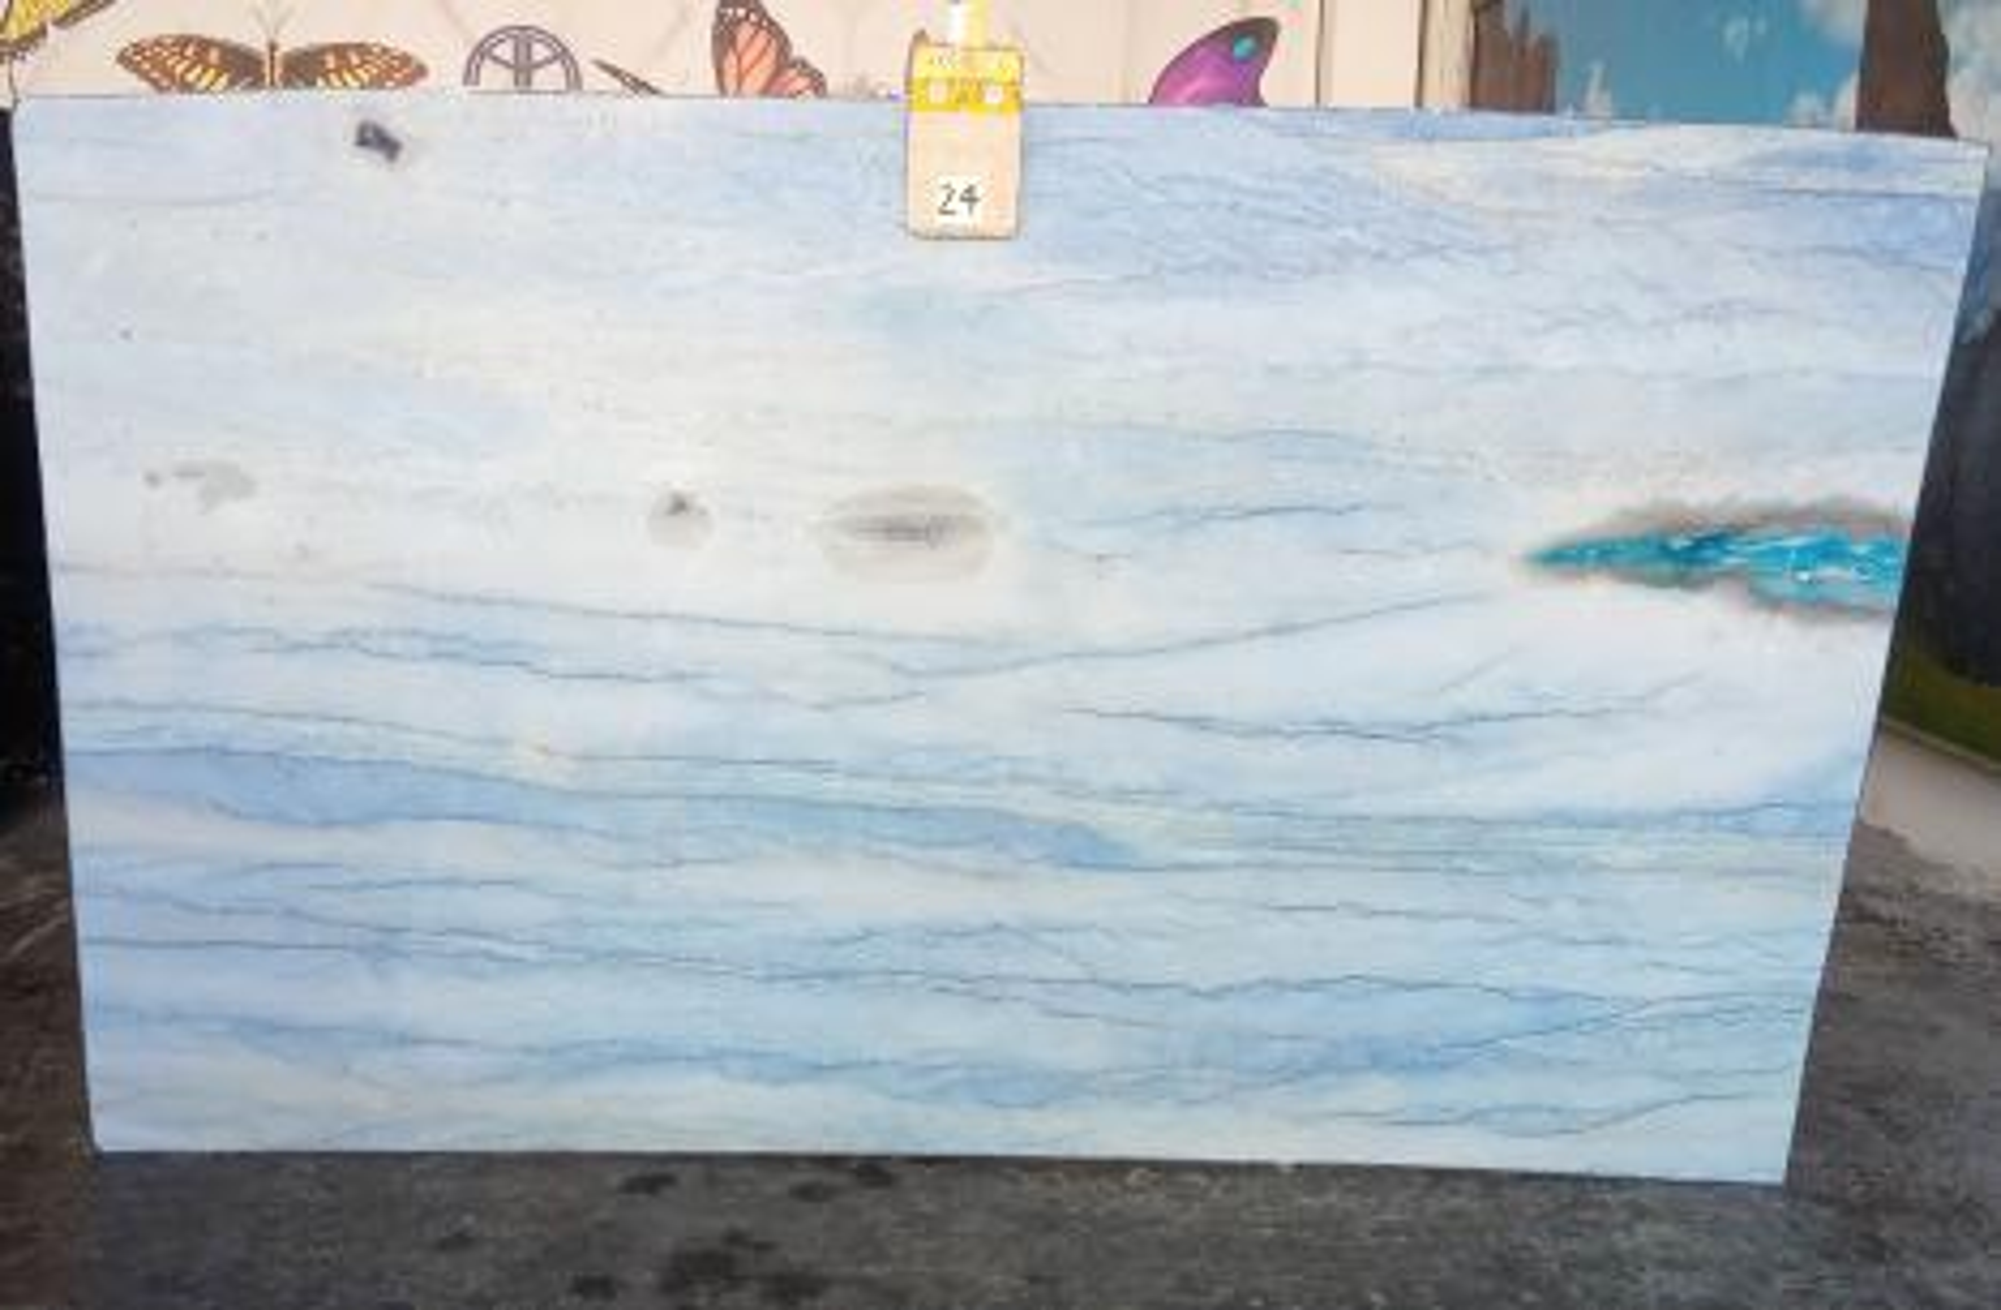 AZUL MAKAUBA Suministro Veneto (Italia) de planchas pulidas en mármol natural Z0191 , Slab #24